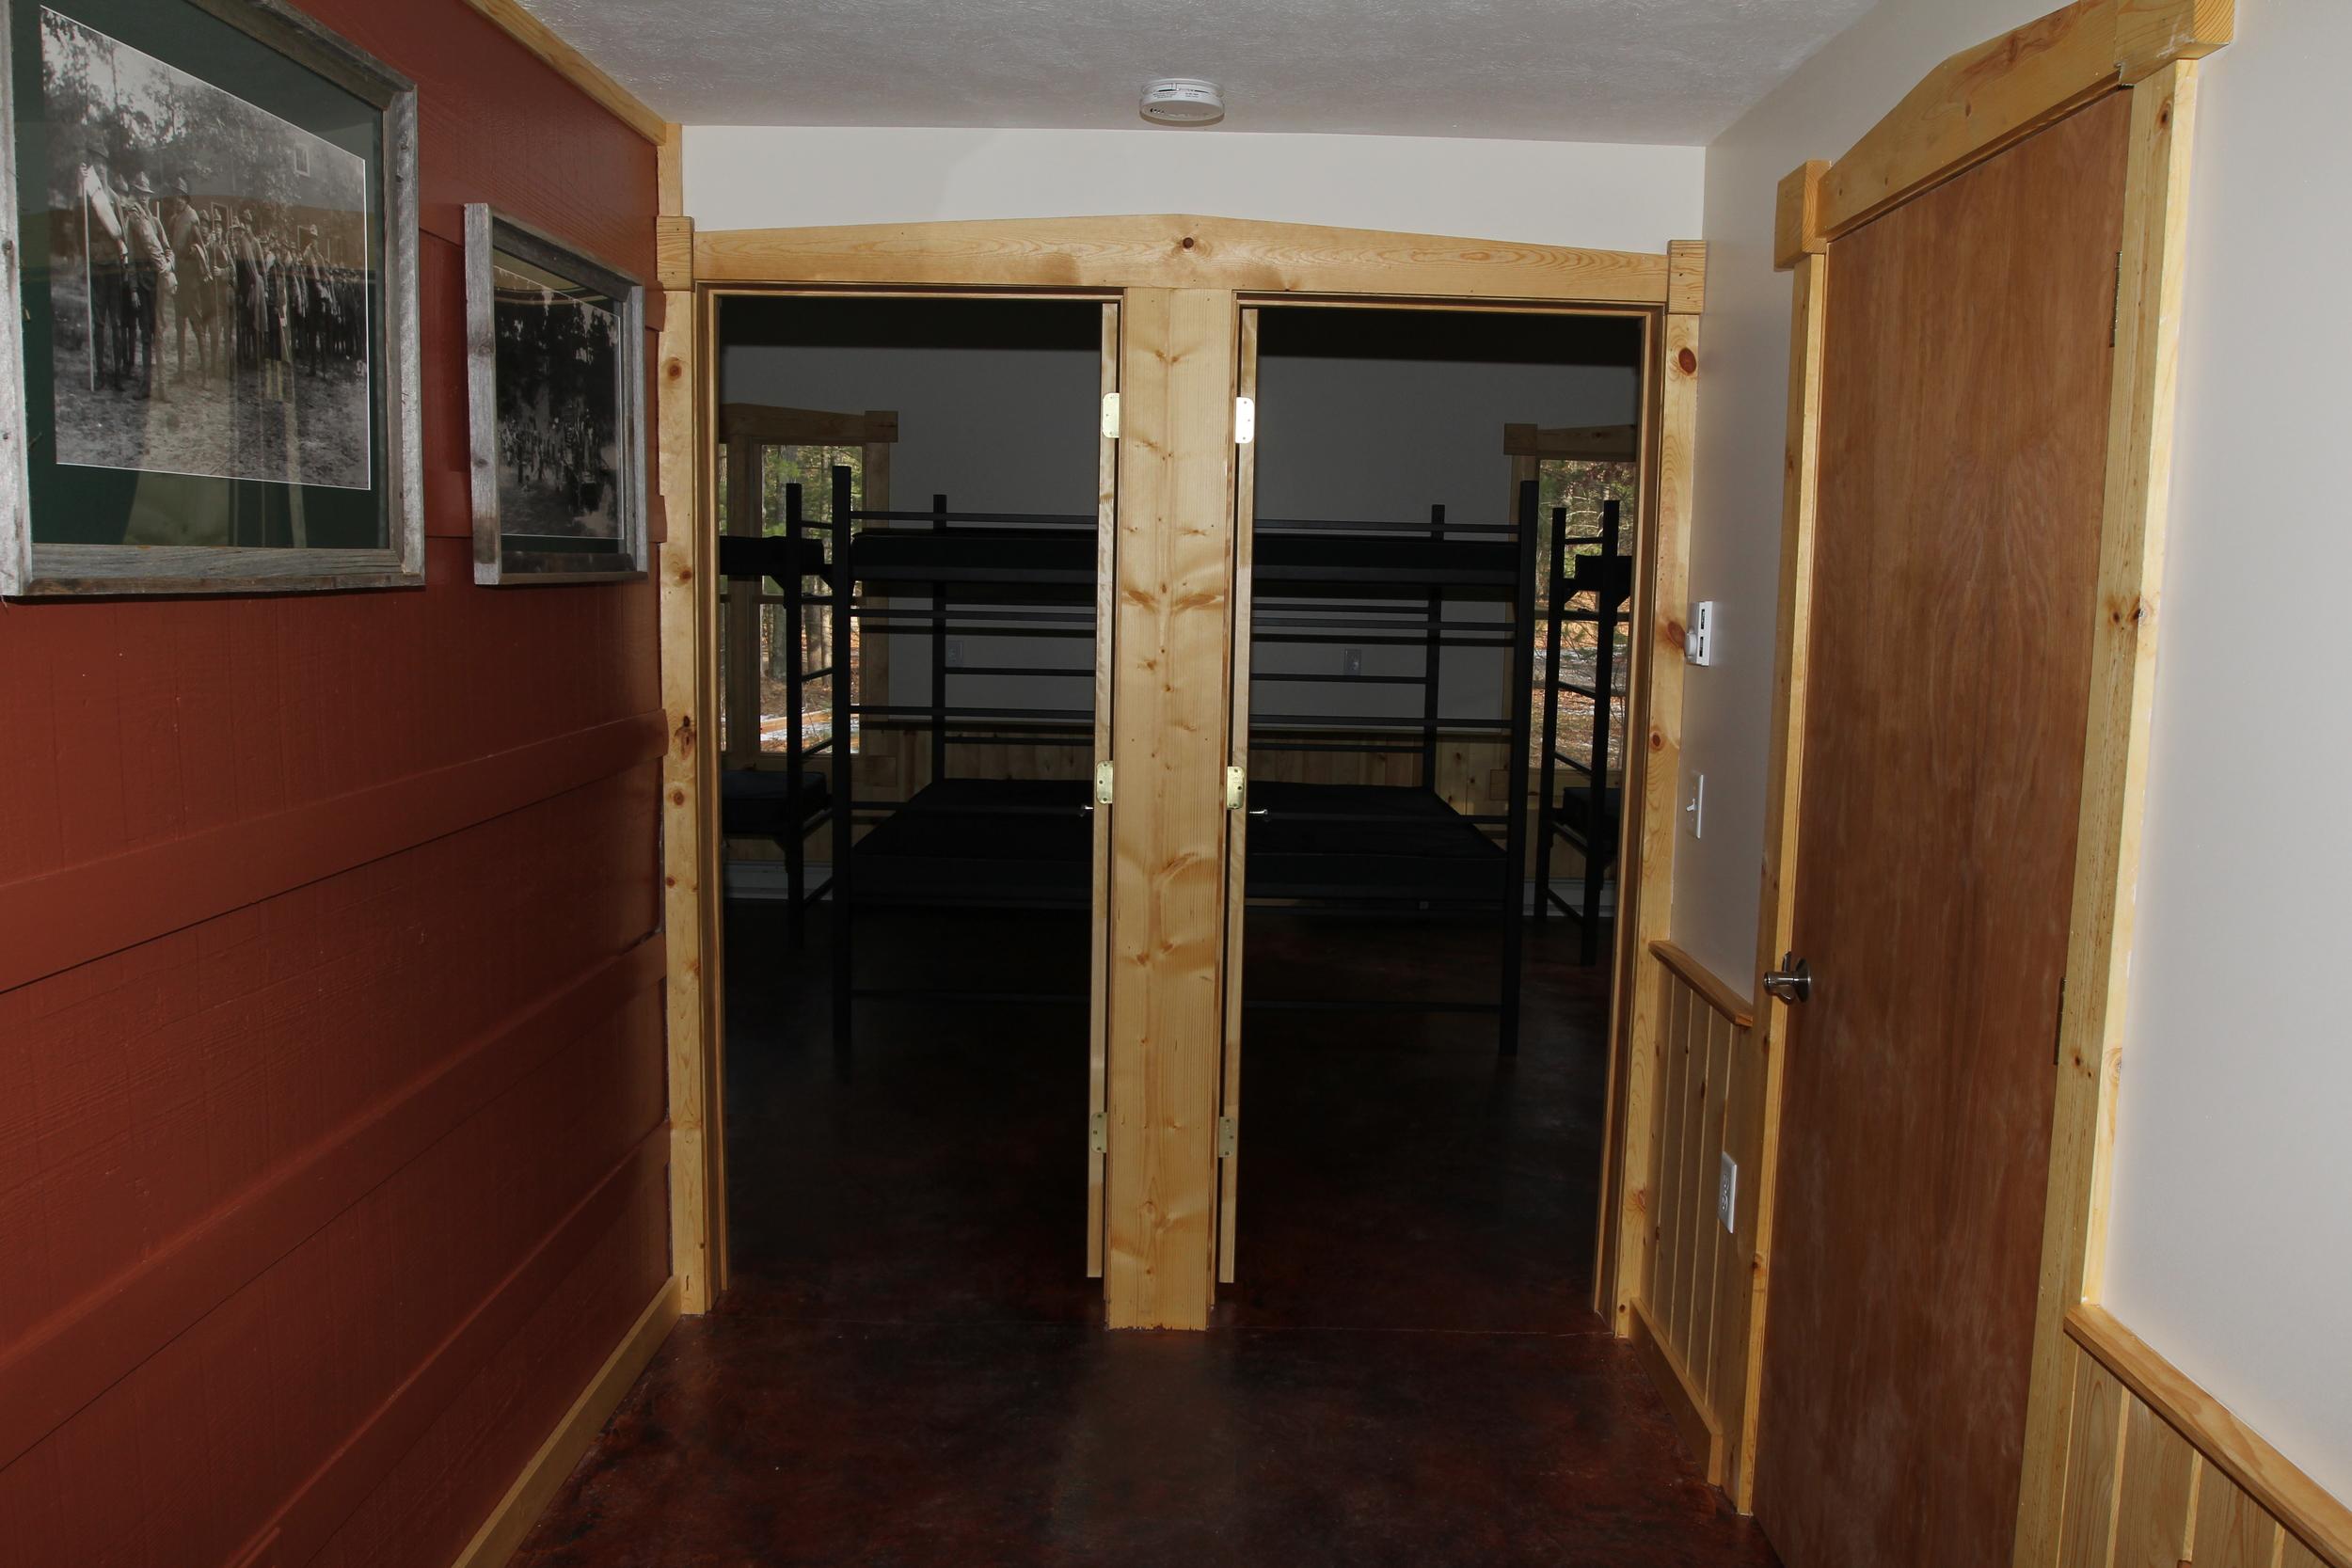 Guest Lodge Bunk Rooms